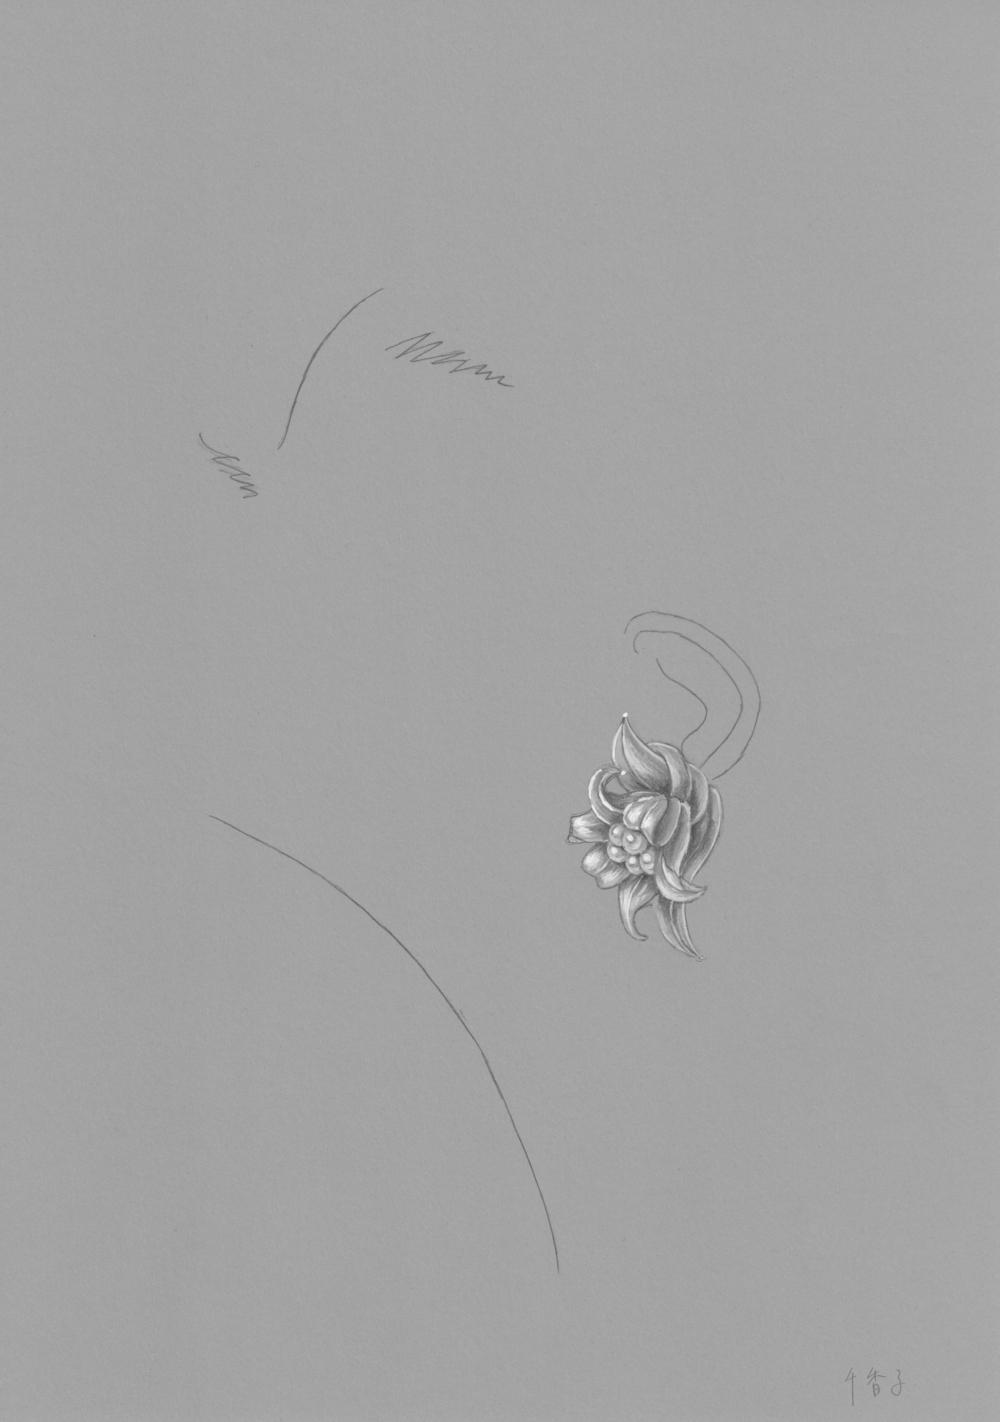 lilyearrings のコピー.jpg